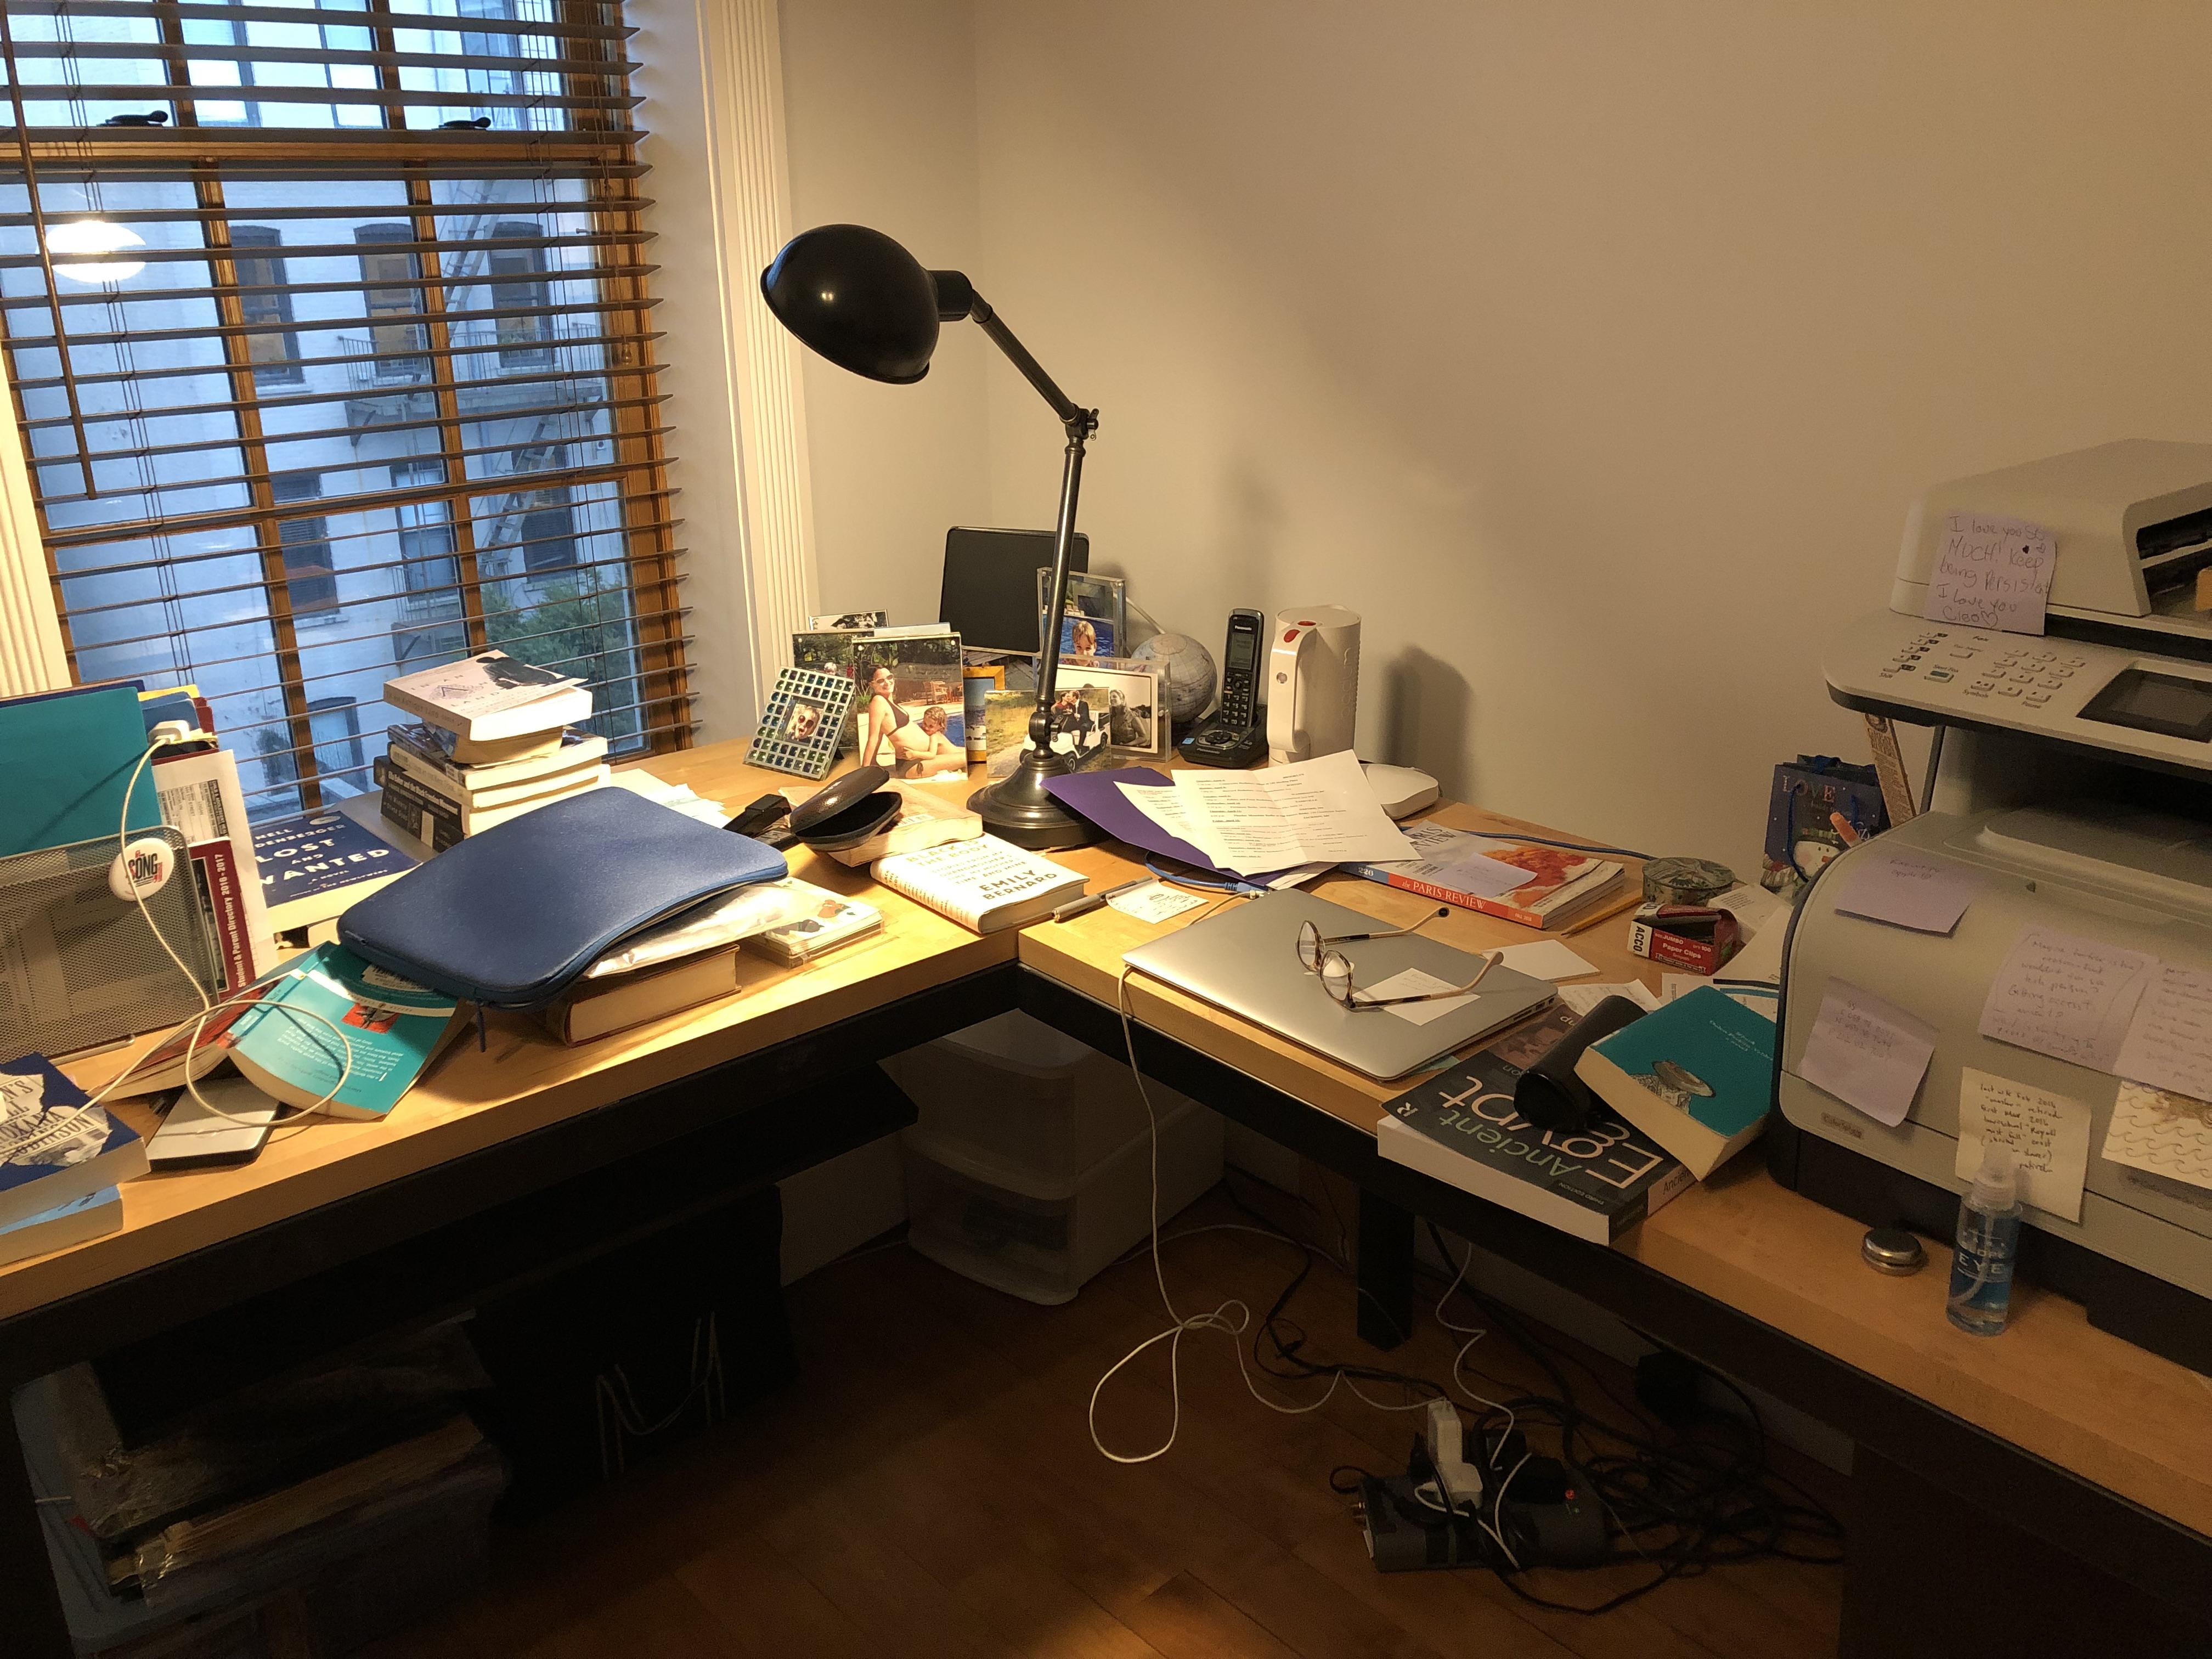 The author's desk.